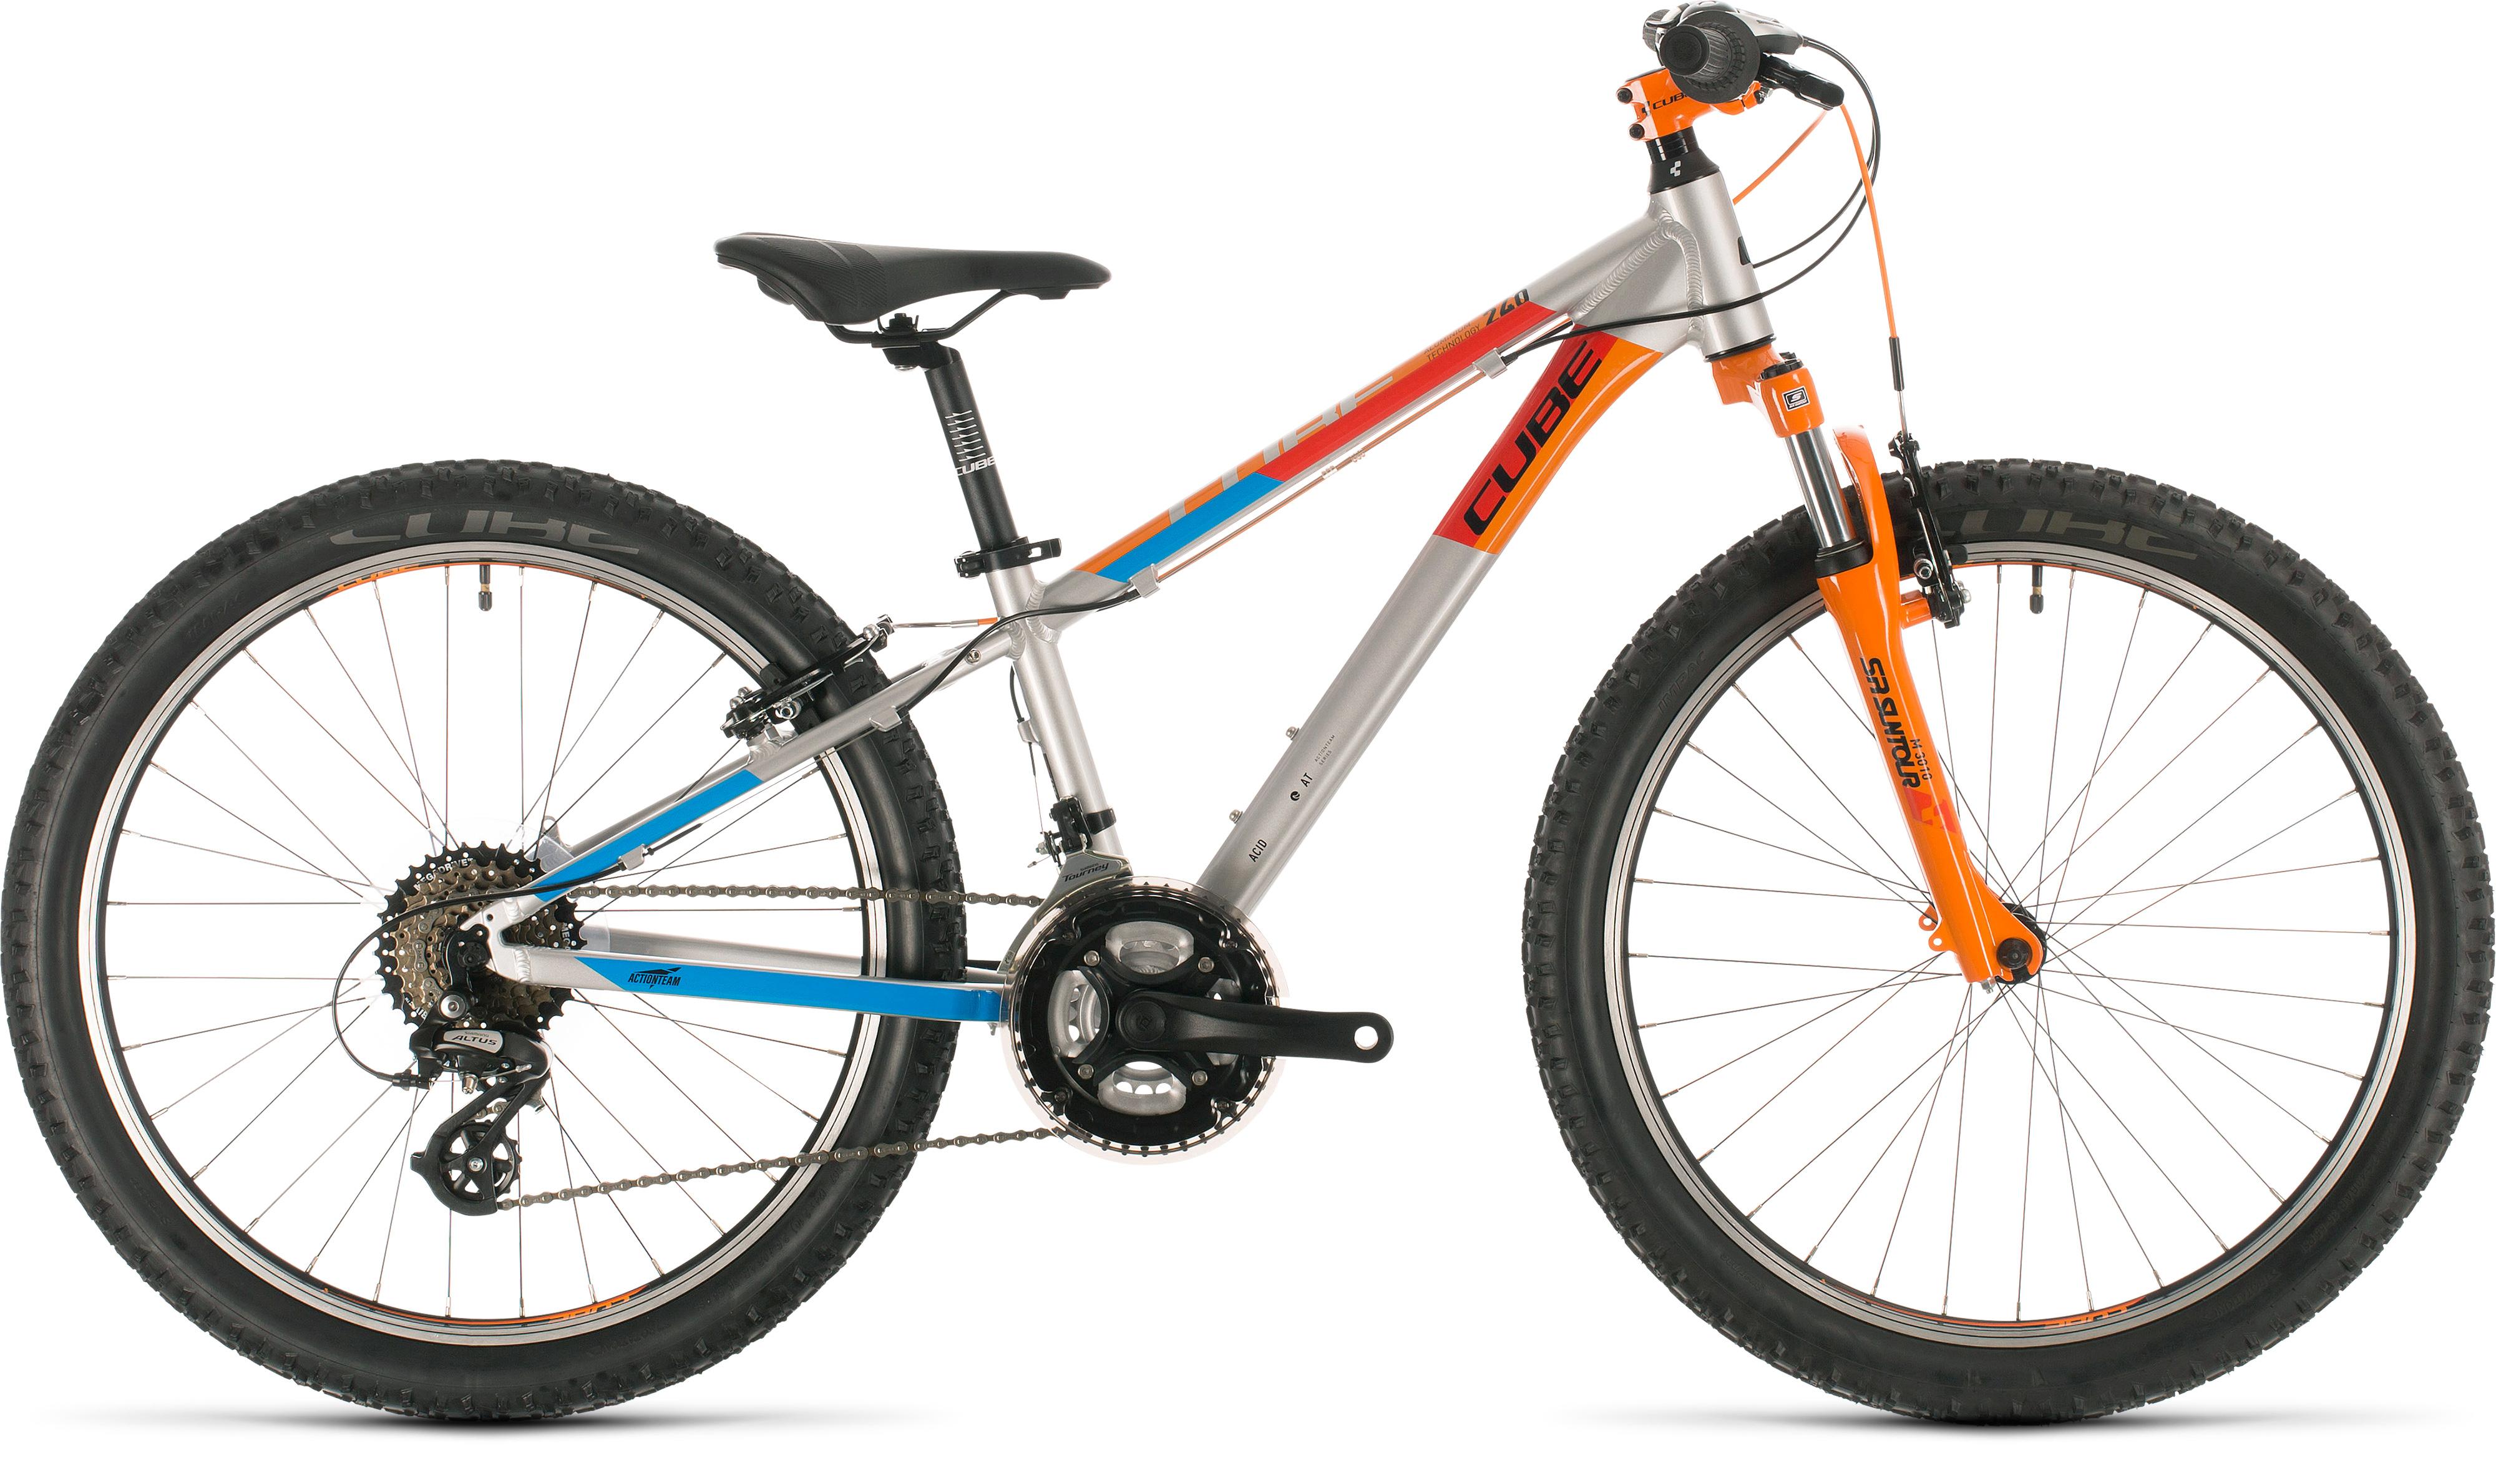 Cube Acid 240 24in Wheel Kids Bike 2020 Actionteam